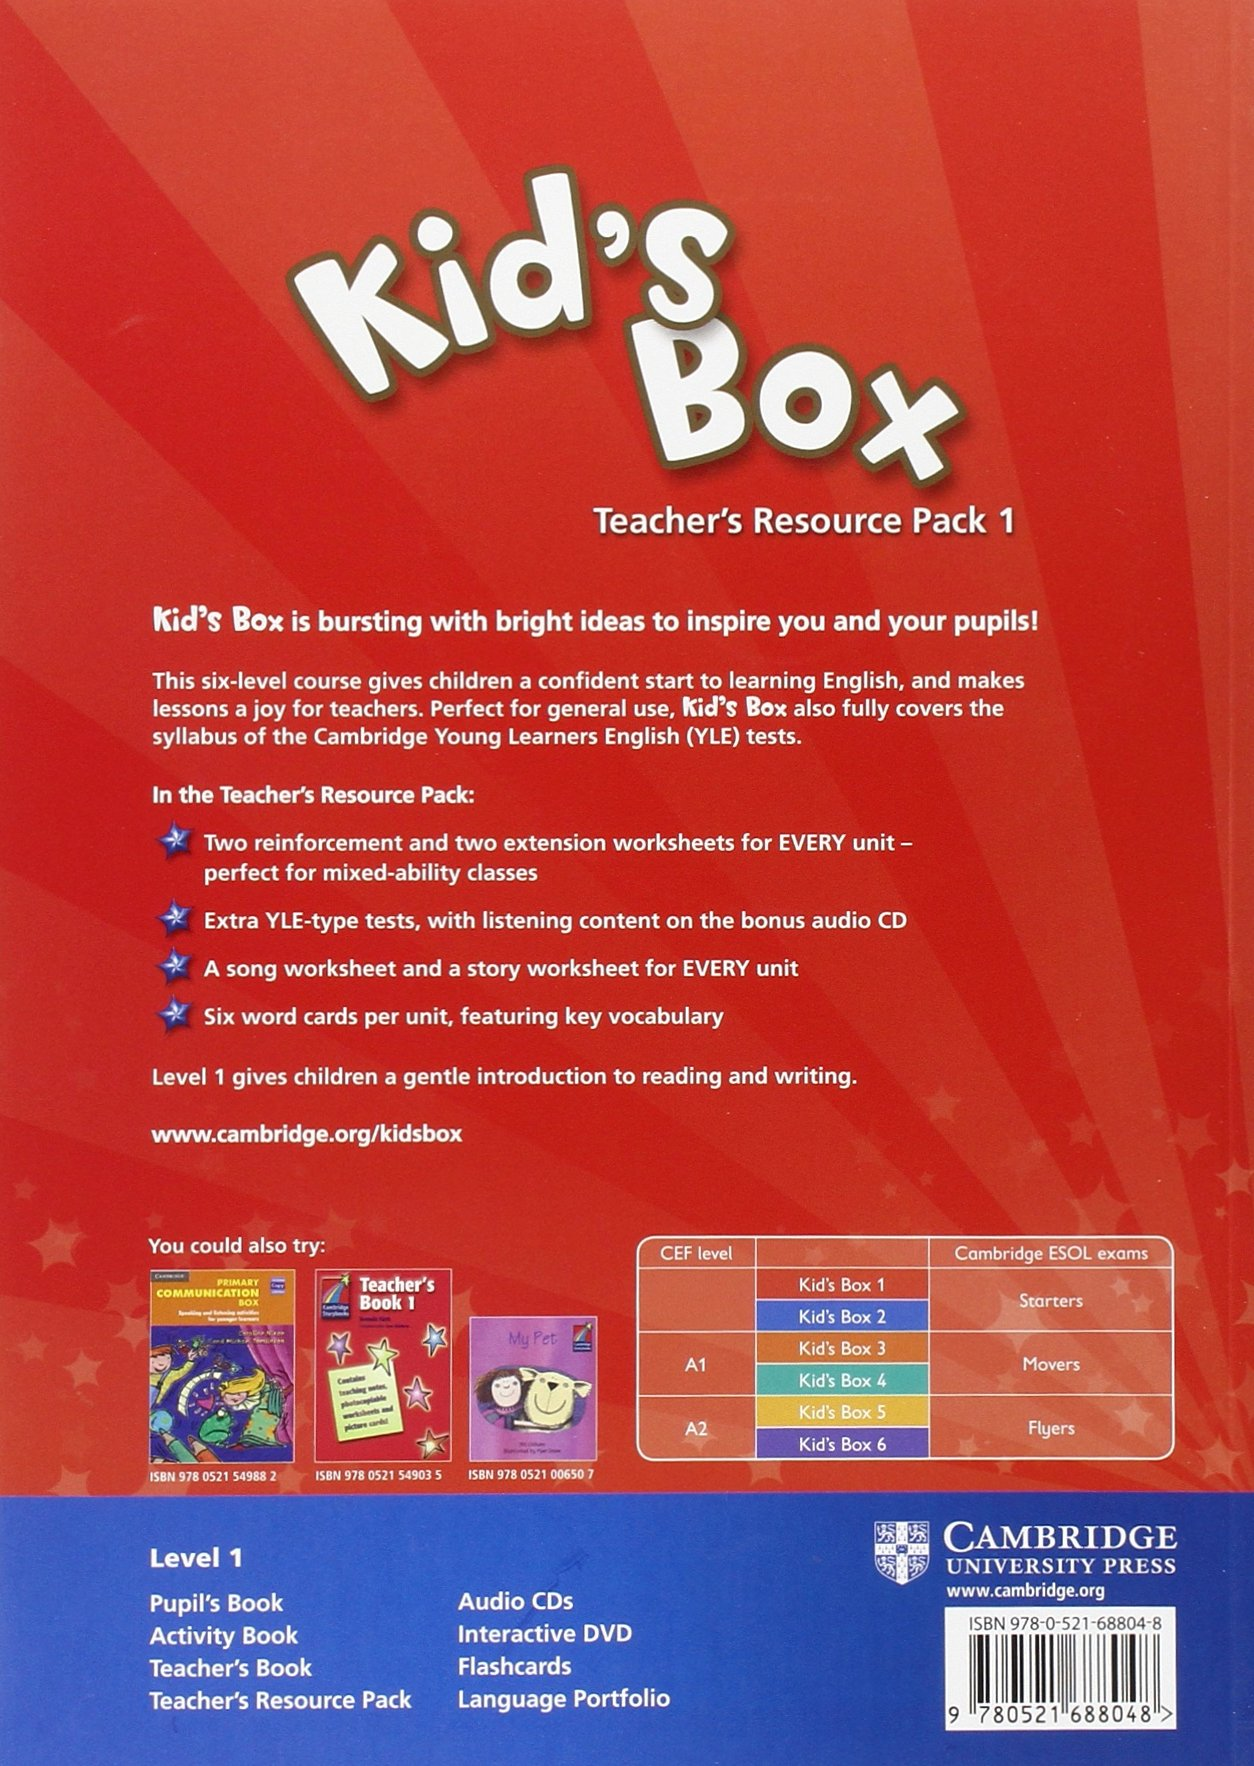 Kid's Box 1 Teacher's Resource Pack with Audio CD: Level 1: Amazon.co.uk:  Caroline Nixon, Michael Tomlinson: 9780521688048: Books